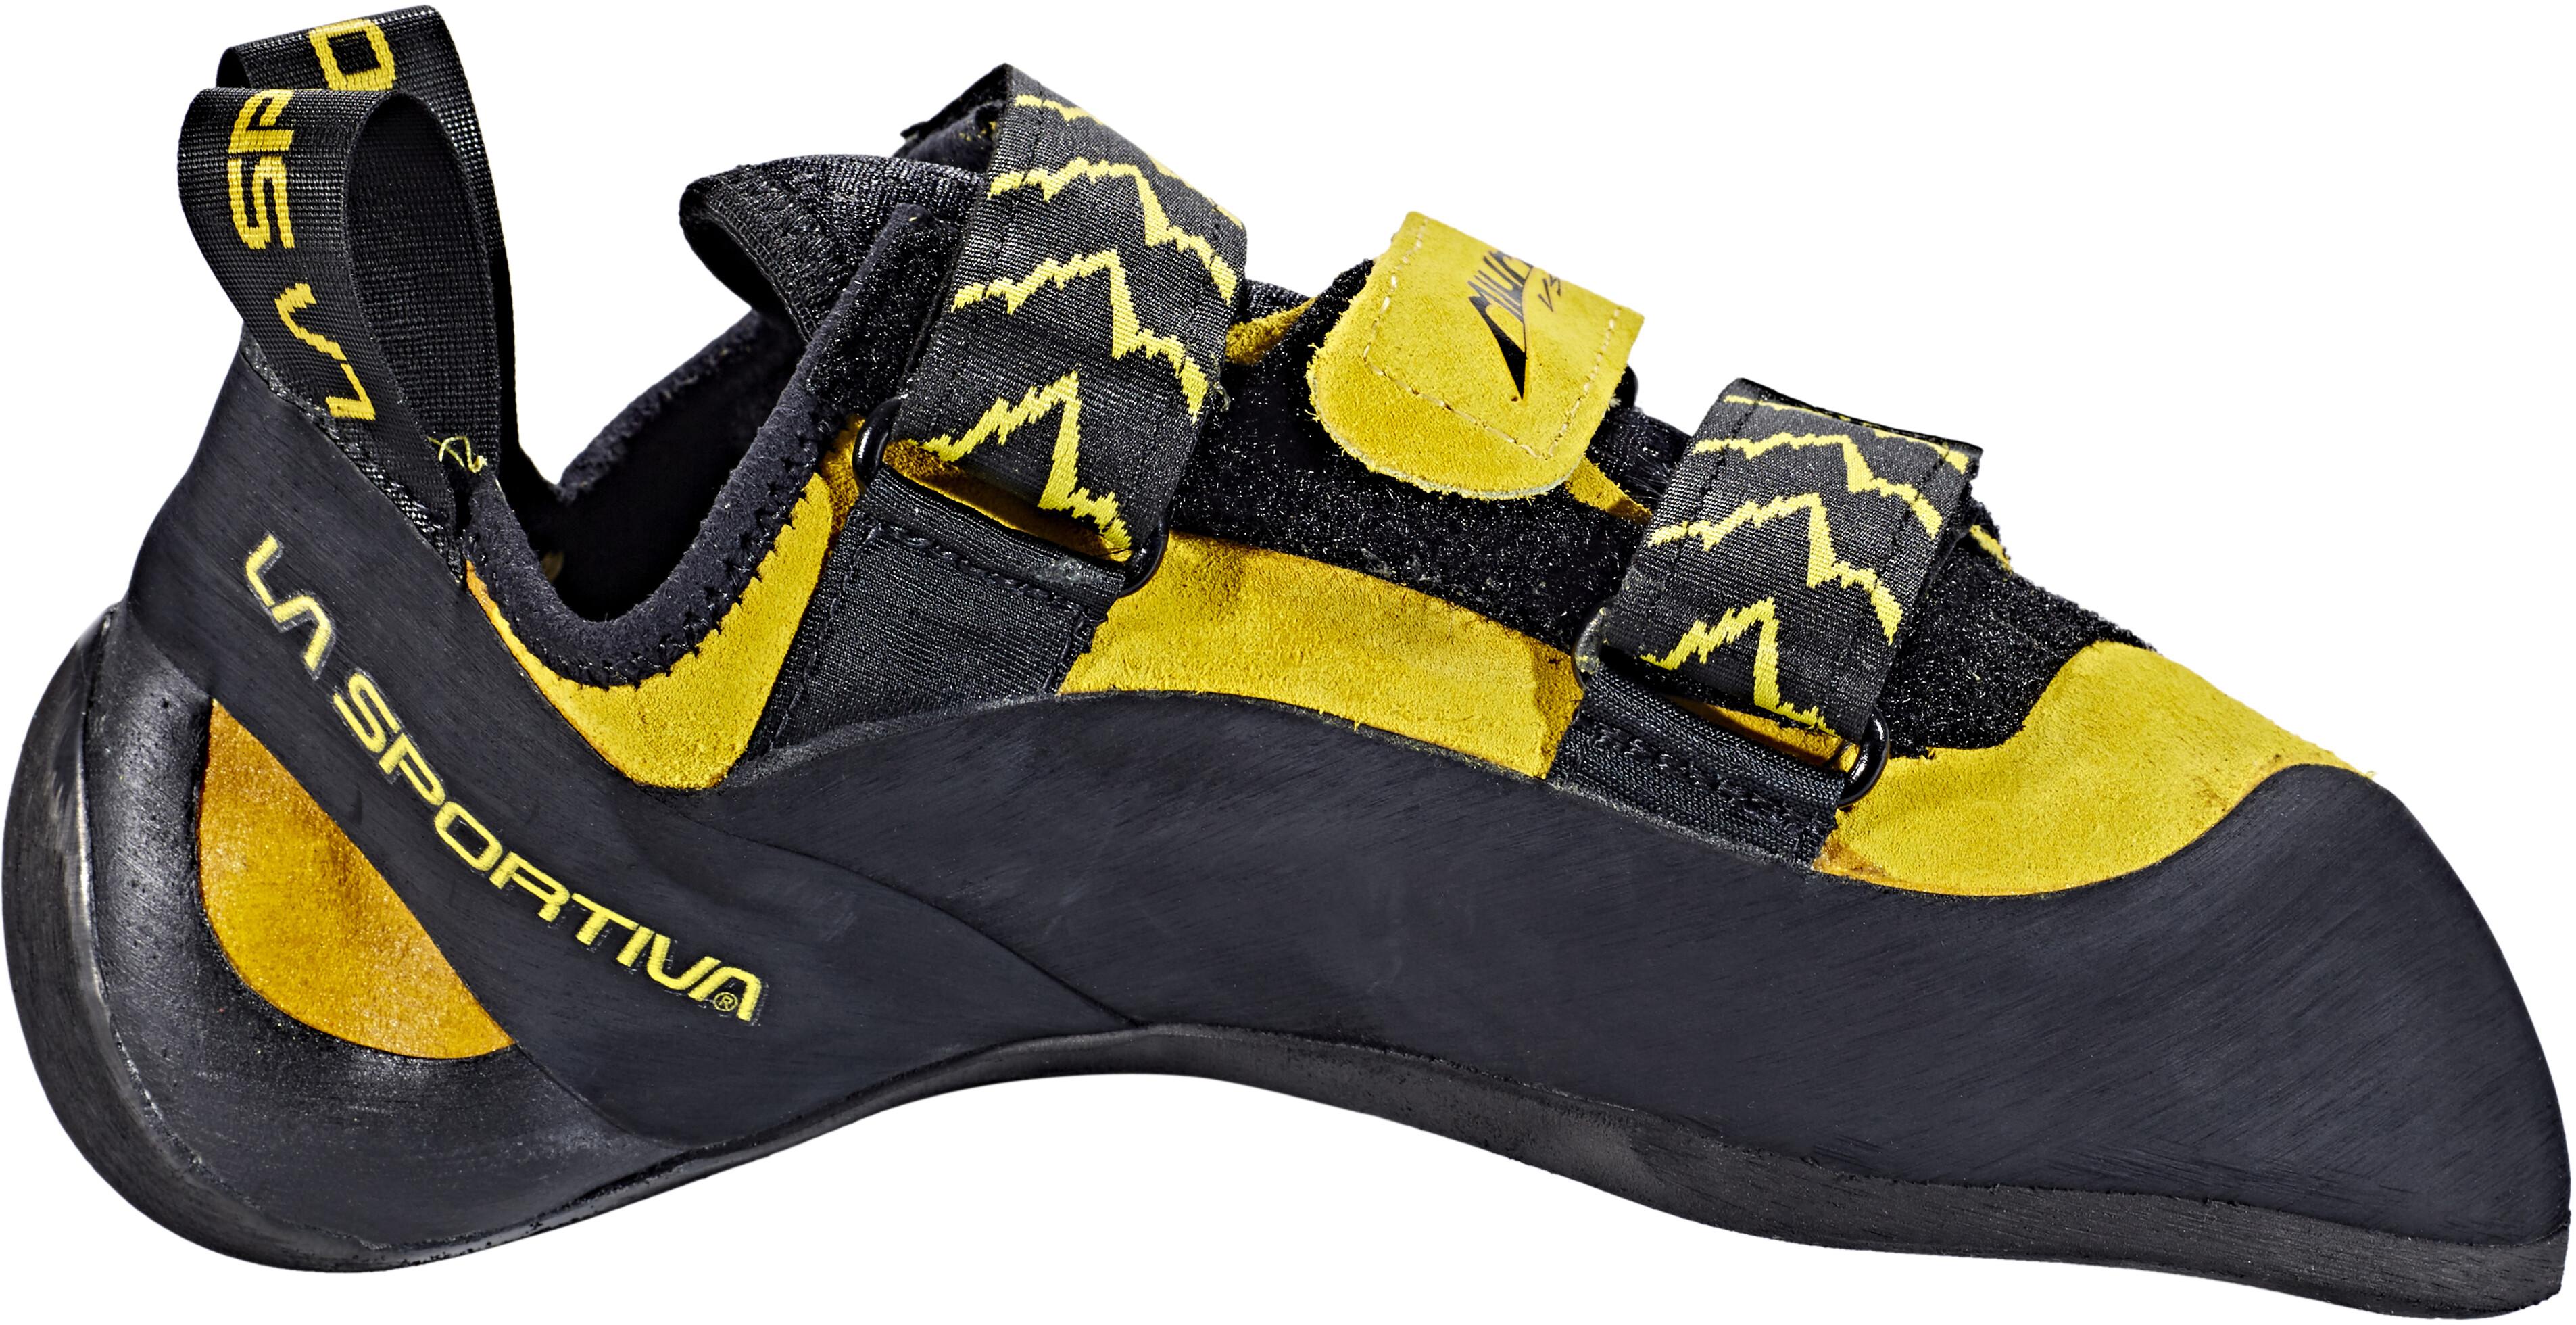 e9b660be La Sportiva Miura VS klimschoenen Heren, yellow/black l Online ...